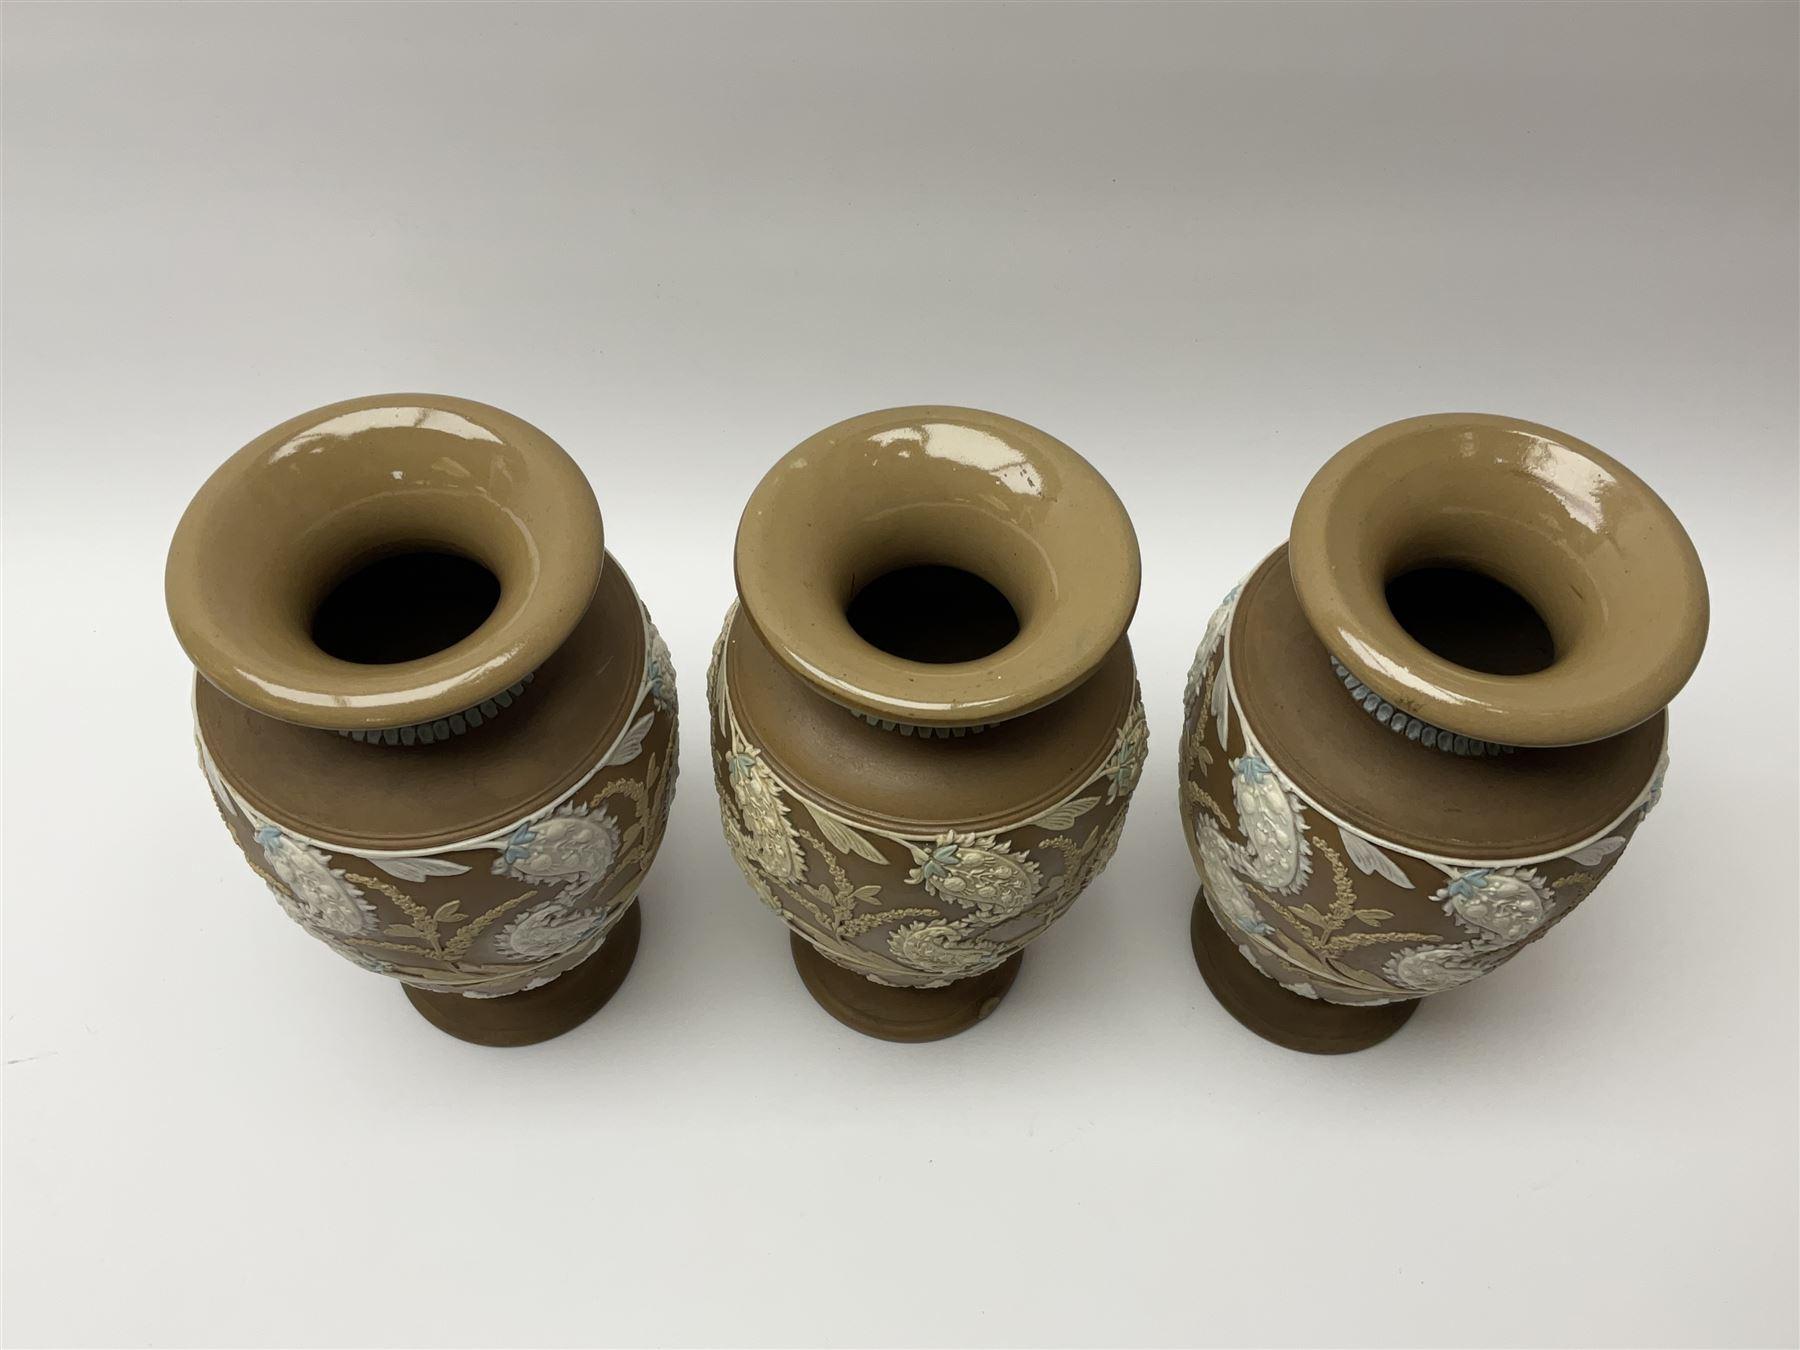 A set of three 19th century Doulton Lambeth silicon ware vases - Image 3 of 3